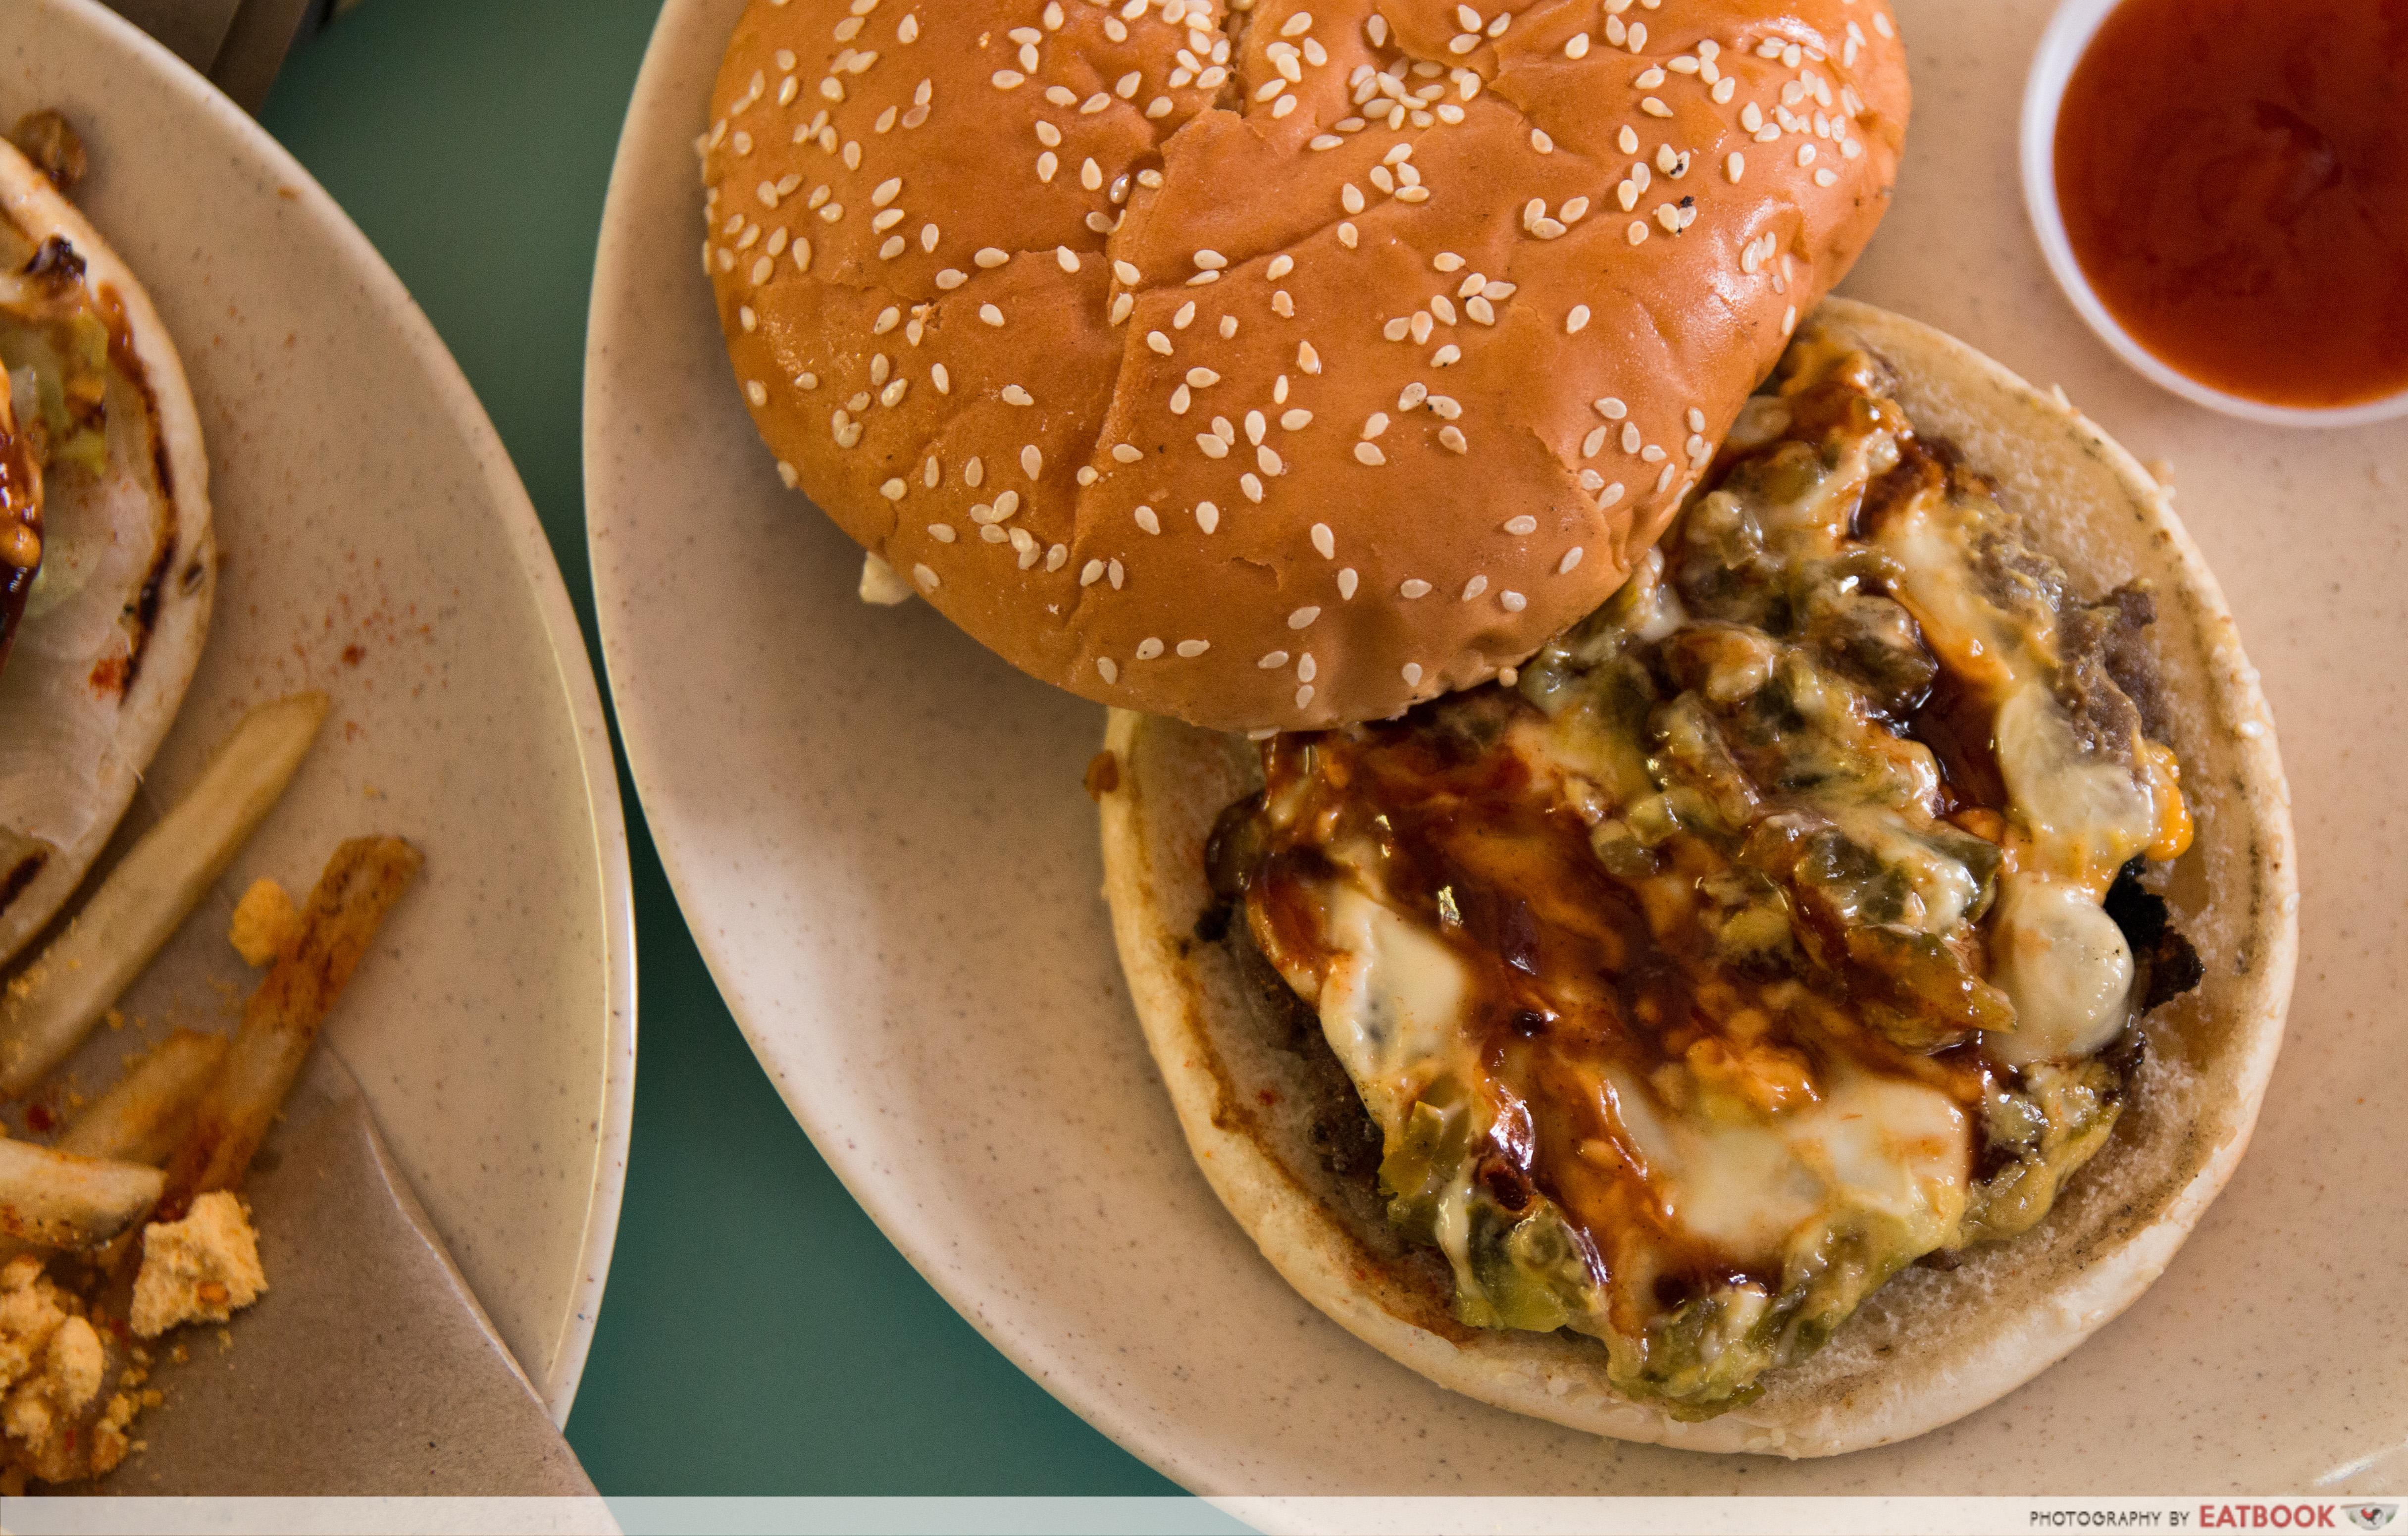 I Love Burger Lah! - Classic Beef Cheeseburger